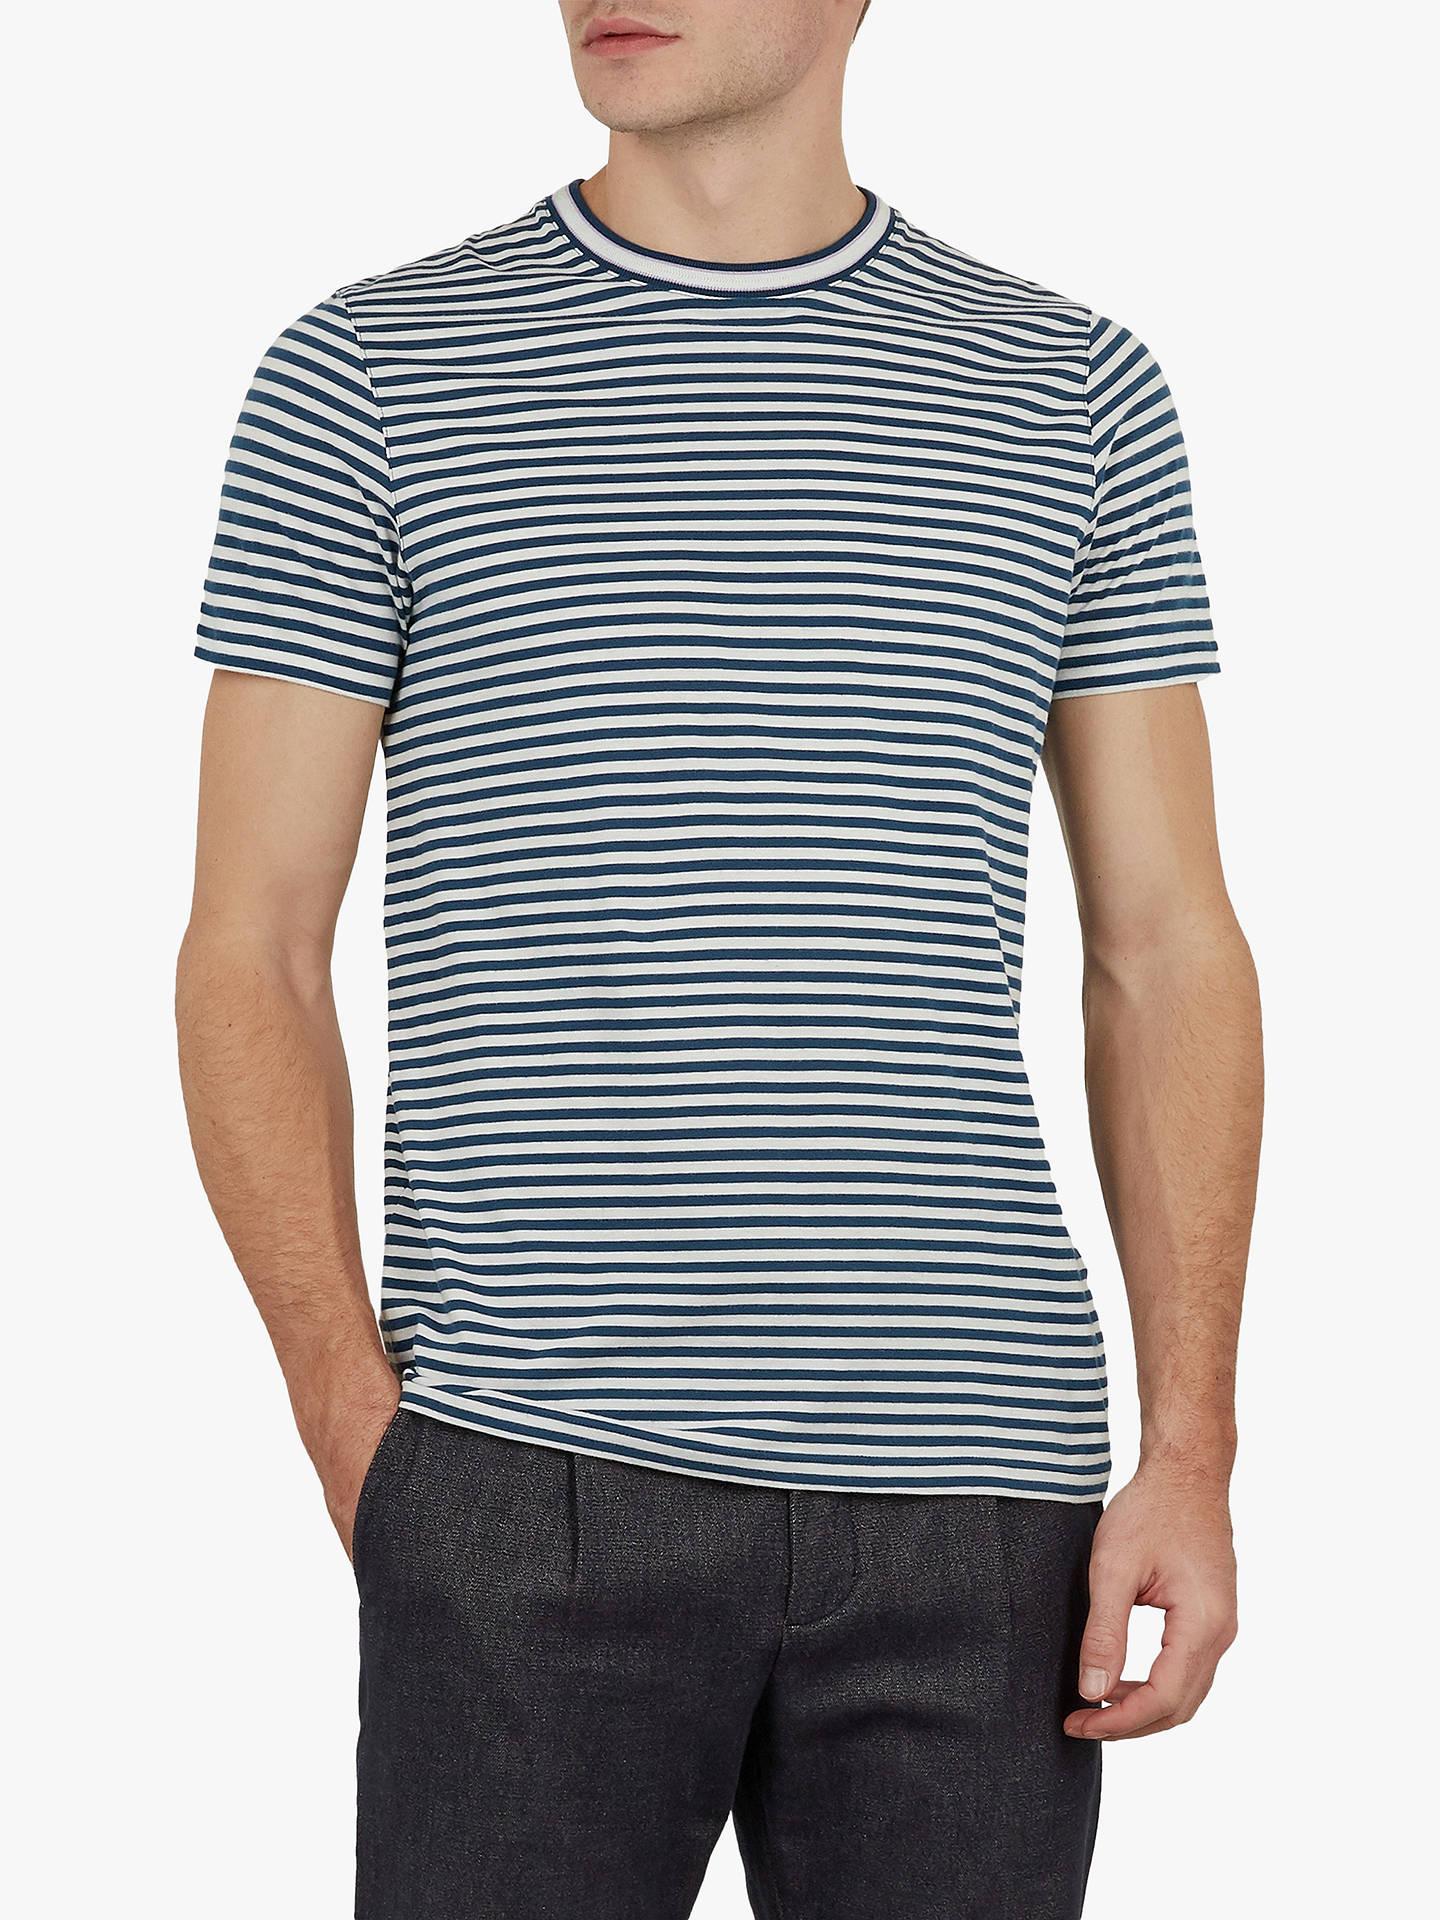 7592a33c Buy Ted Baker Lemur Striped T-Shirt, Dark Blue, L Online at johnlewis ...